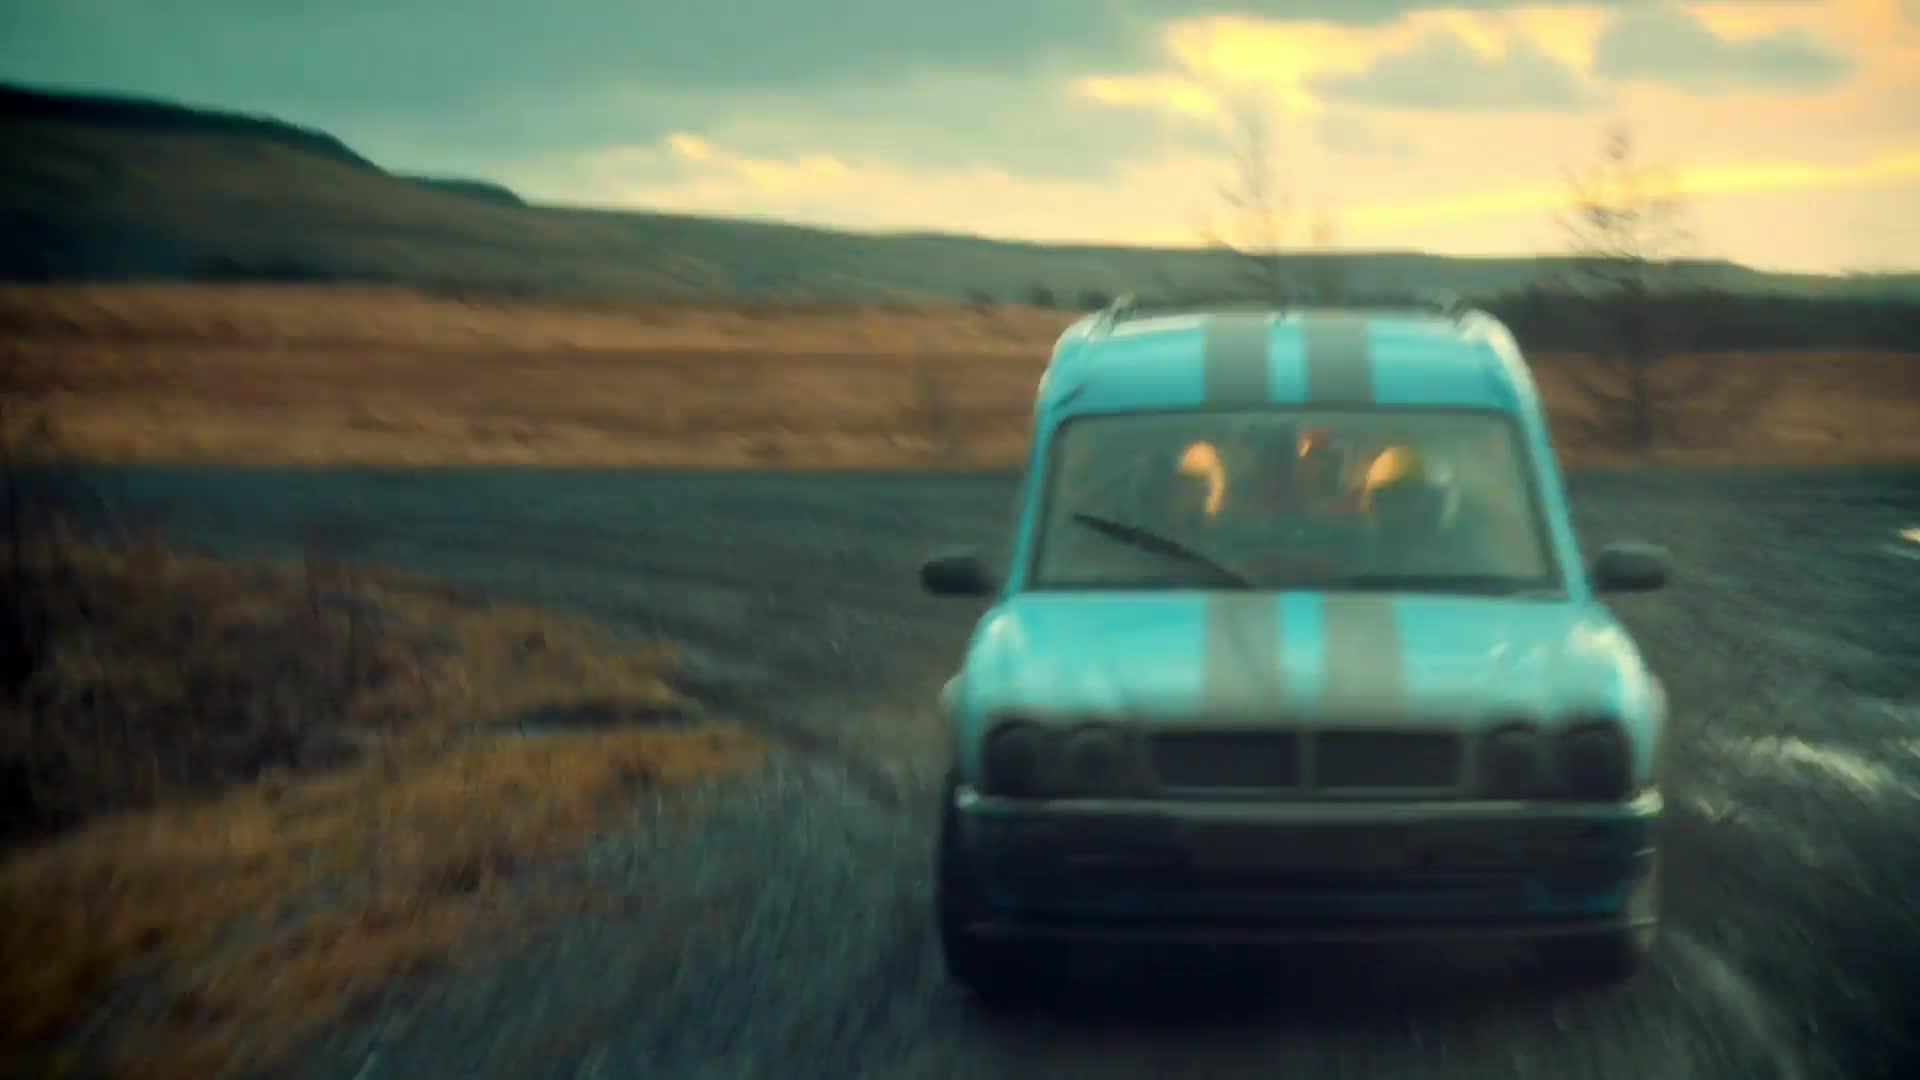 Top Gear's Matt LeBlanc Makes Low-Key Exit As He Hosts His Final Show